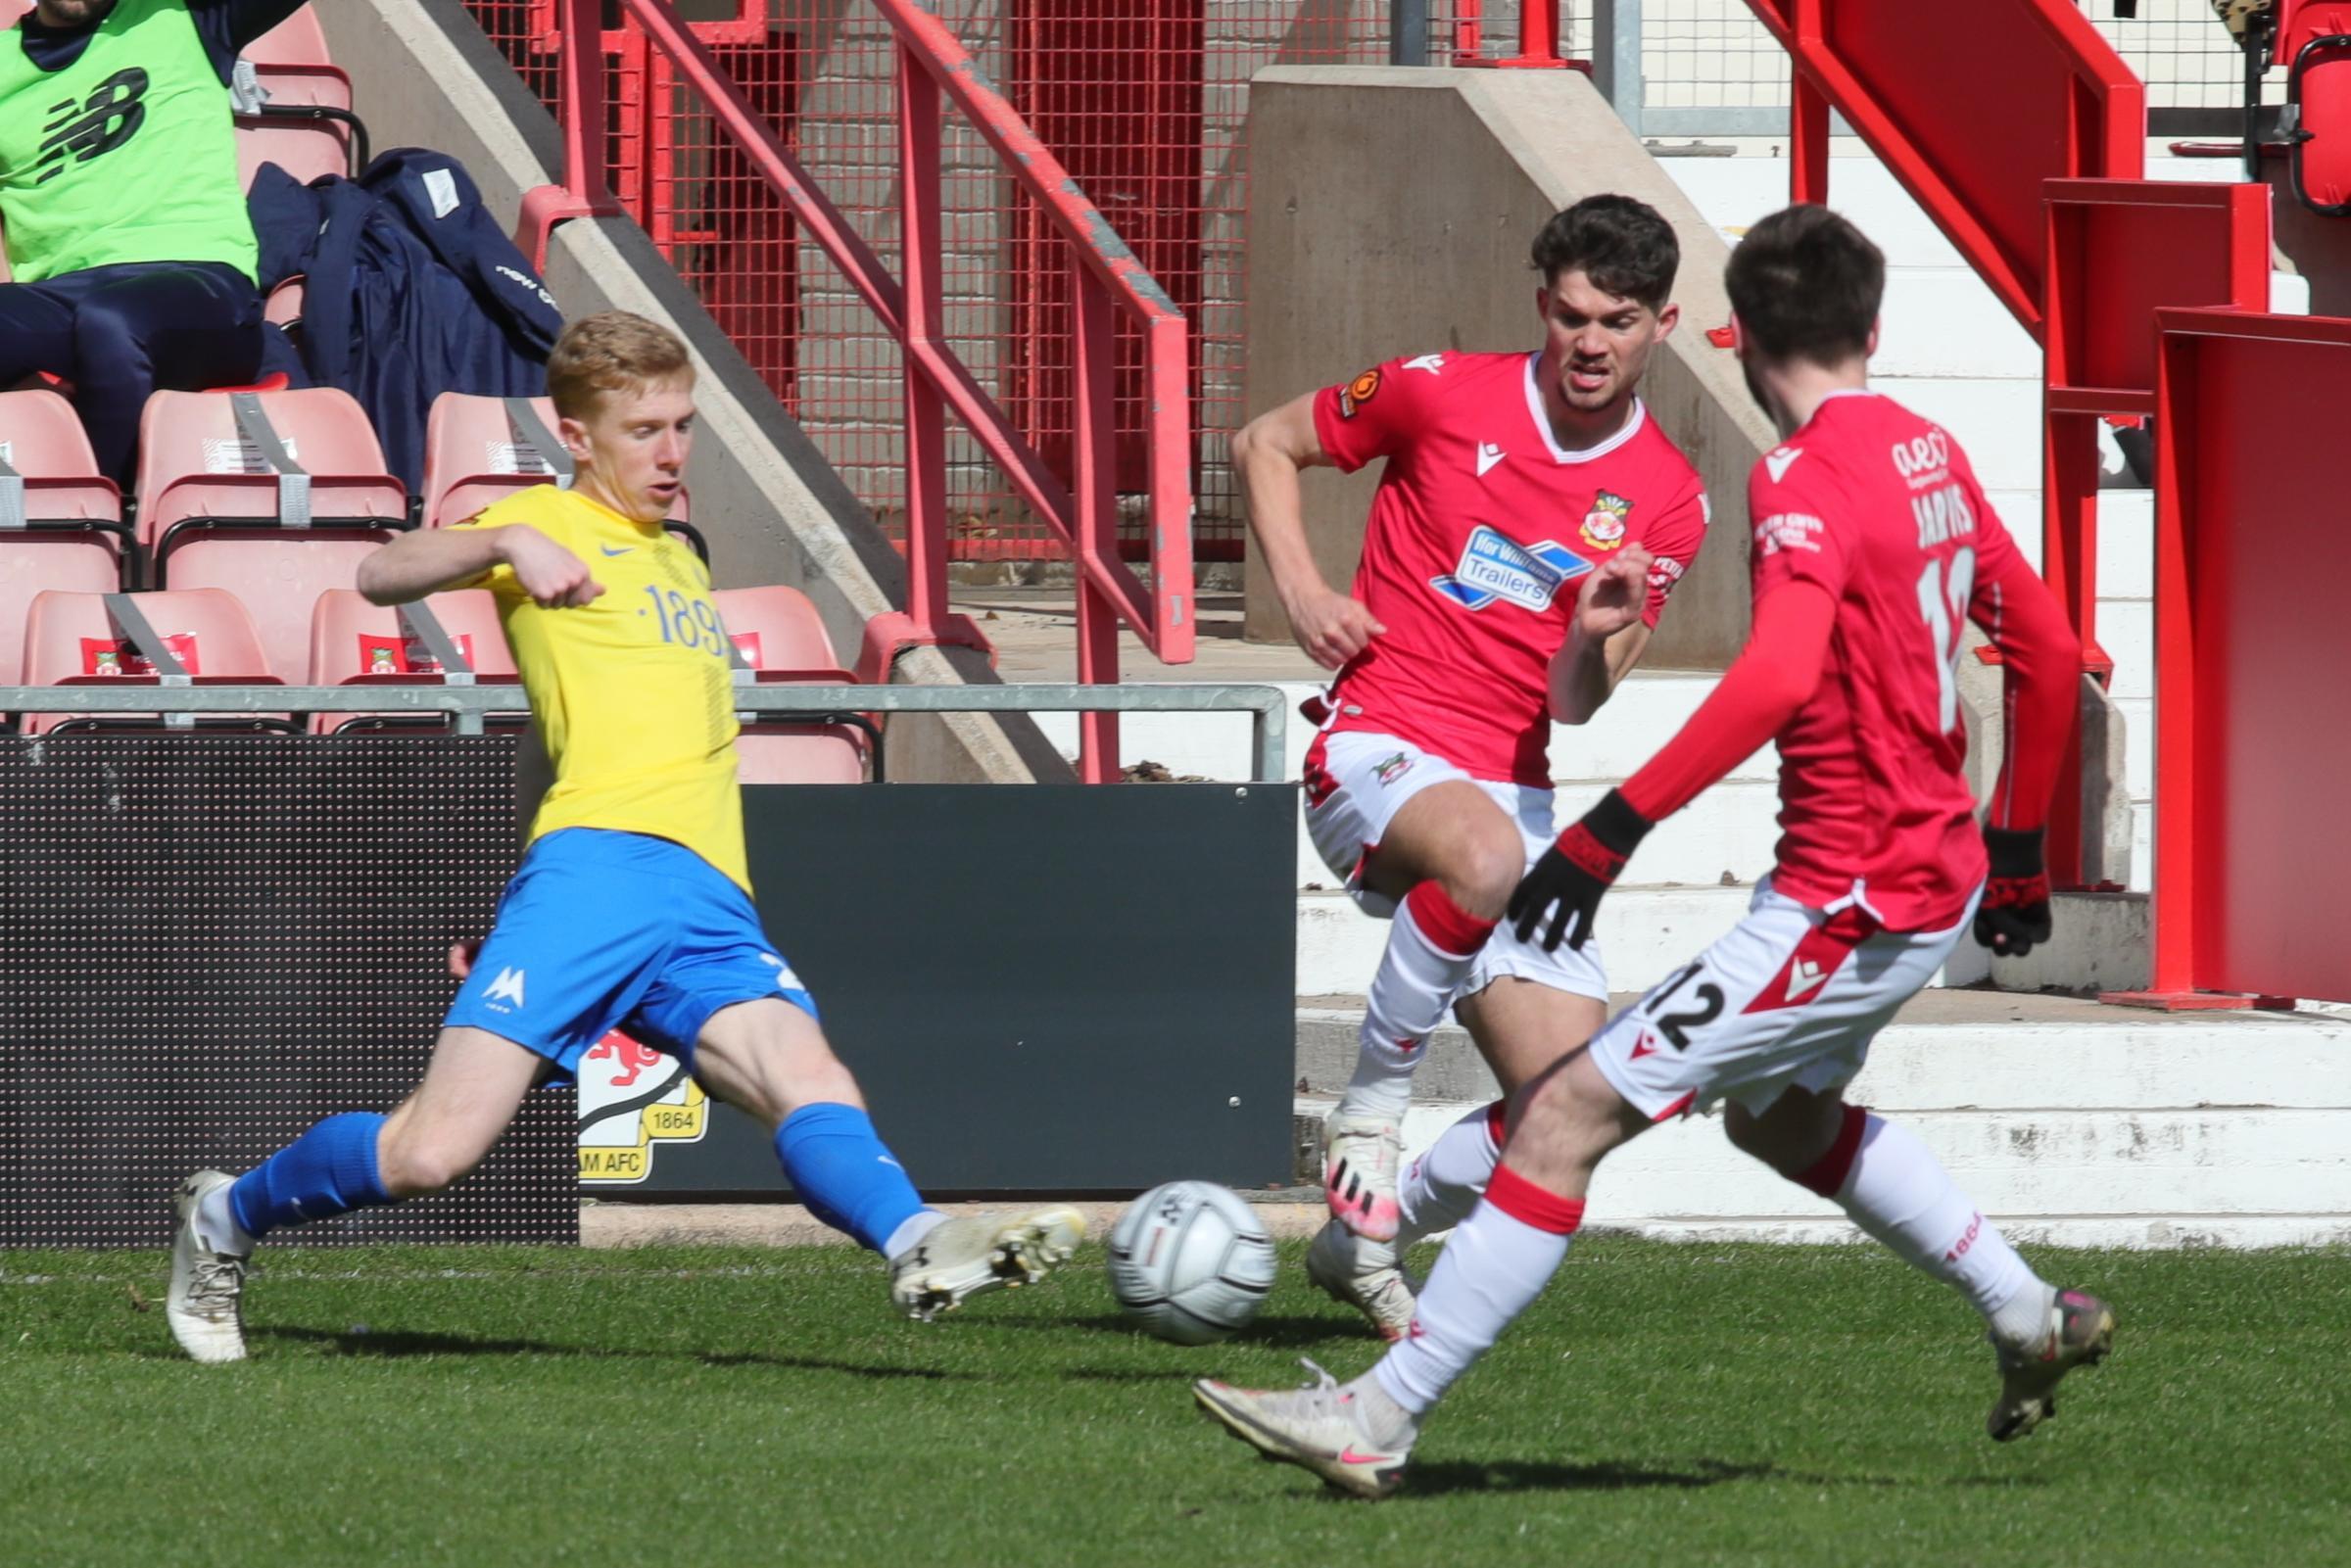 Wrexham AFC hat-trick hero Jordan Davies cannot contain his delight